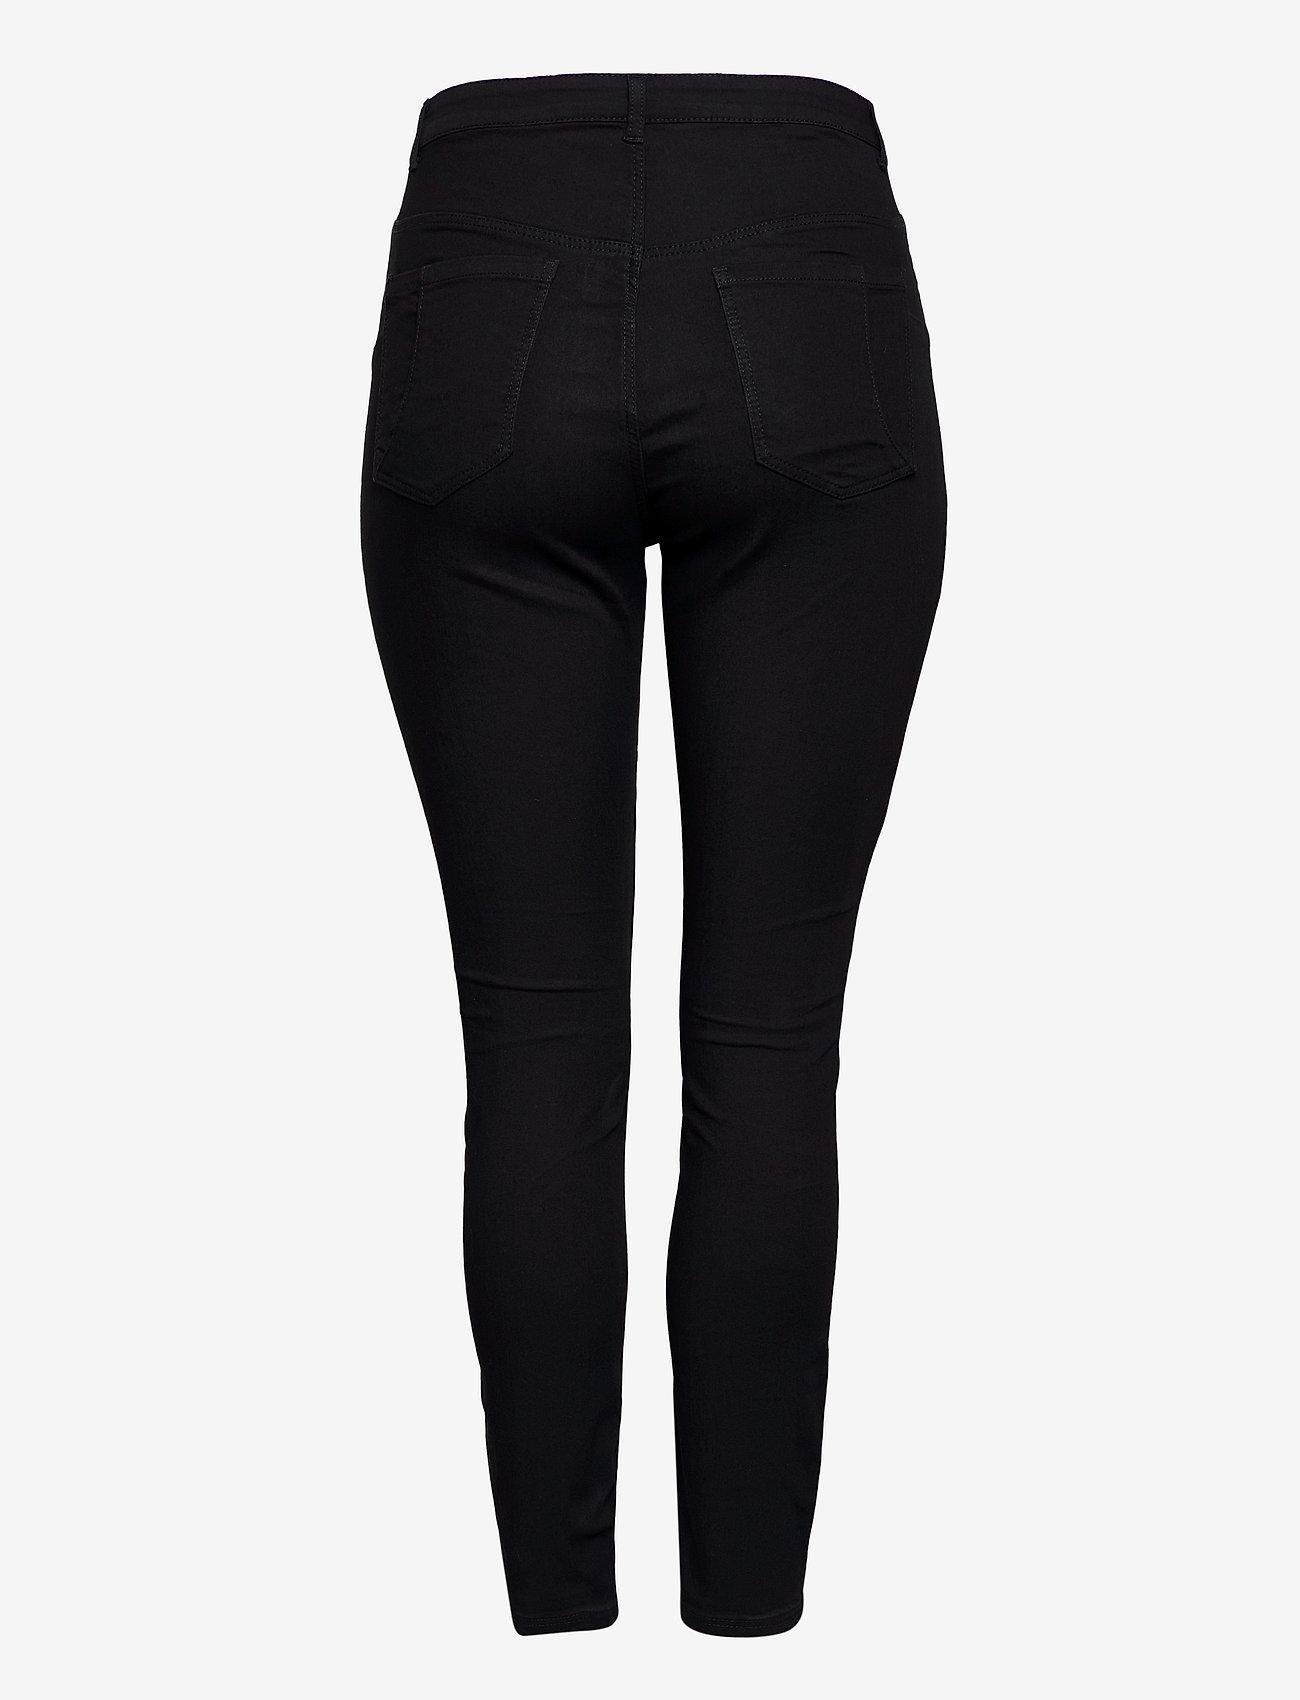 JunaRose - JRZEROTANJA SL BLACK JEANS - K NOOS - slim jeans - black - 1